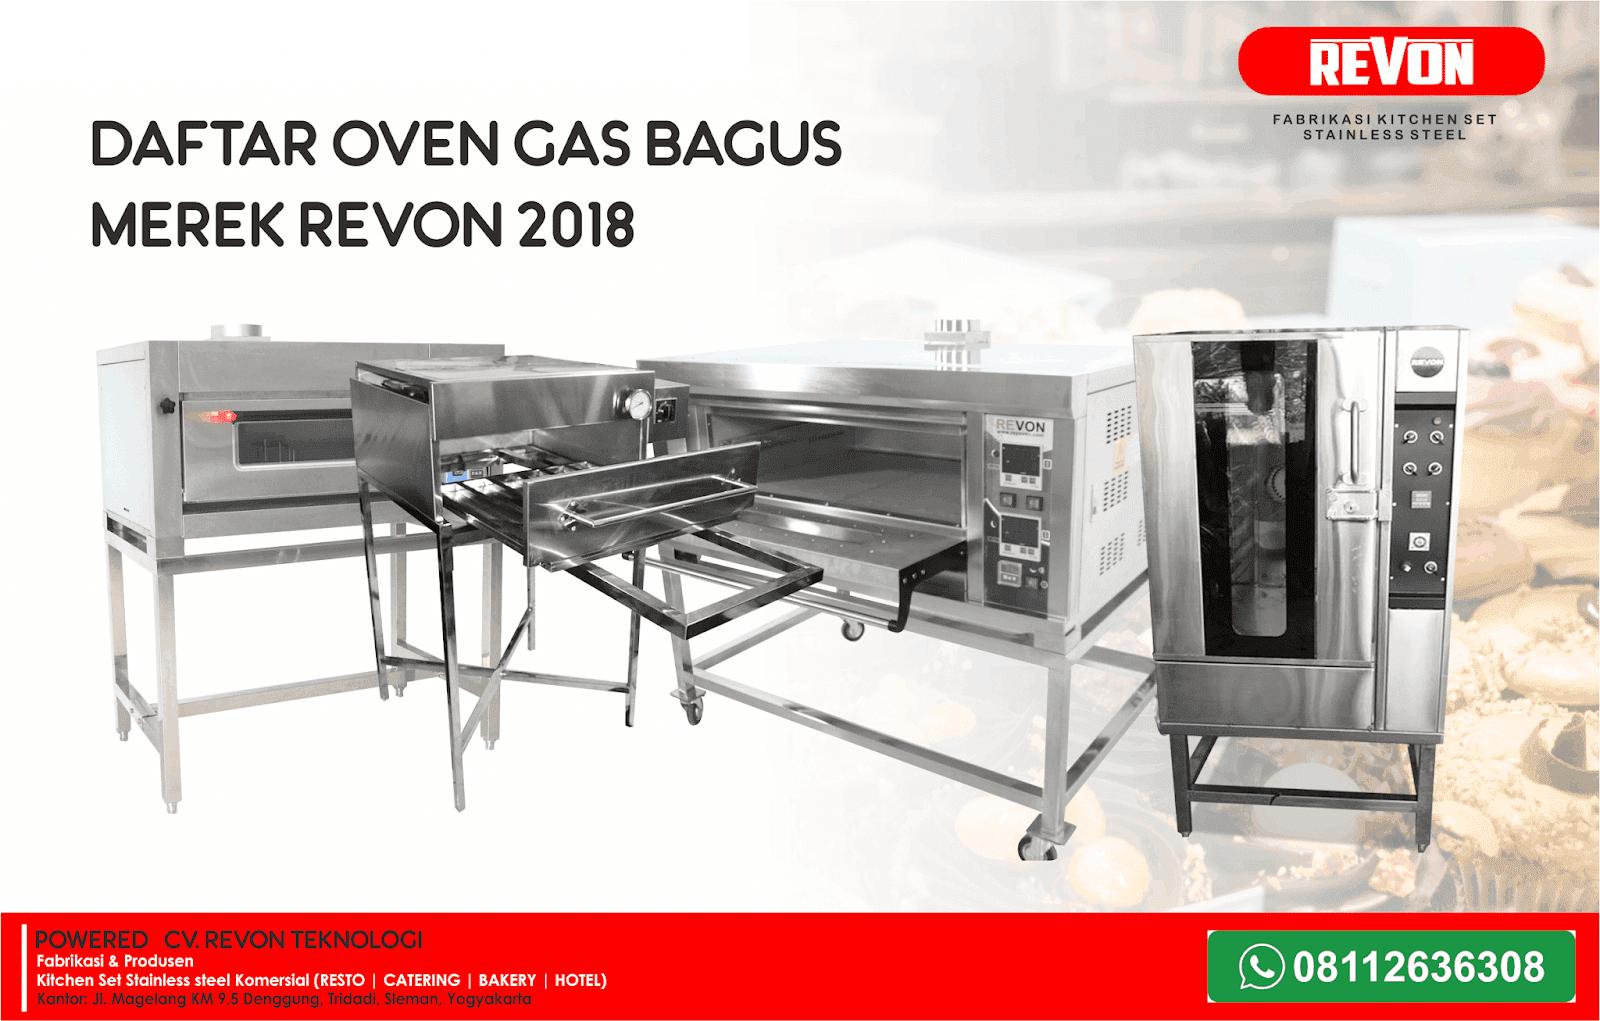 Daftar Oven Gas Bagus Merek Revon Untuk Usaha Roti & Kue